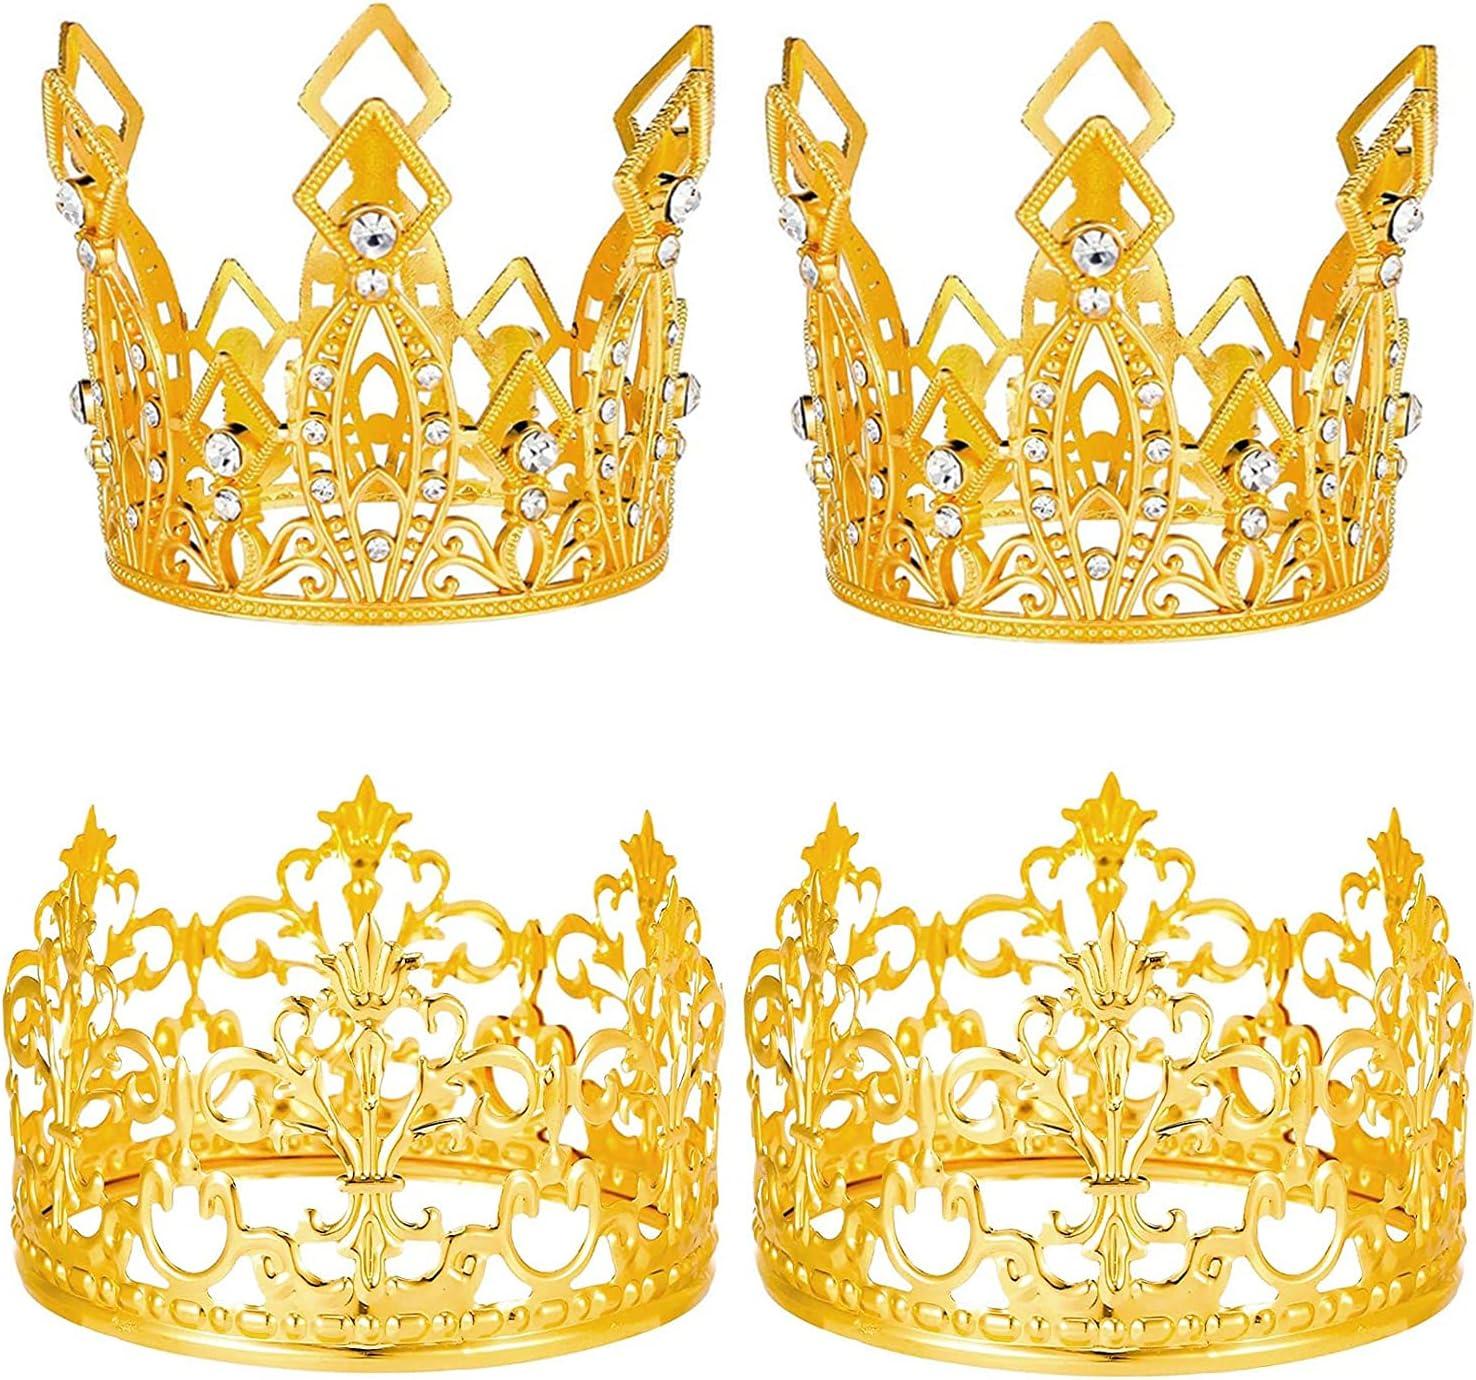 Teblacker 4 Dedication Pieces Gold Crown Tiara Topper Cake Branded goods Toppe